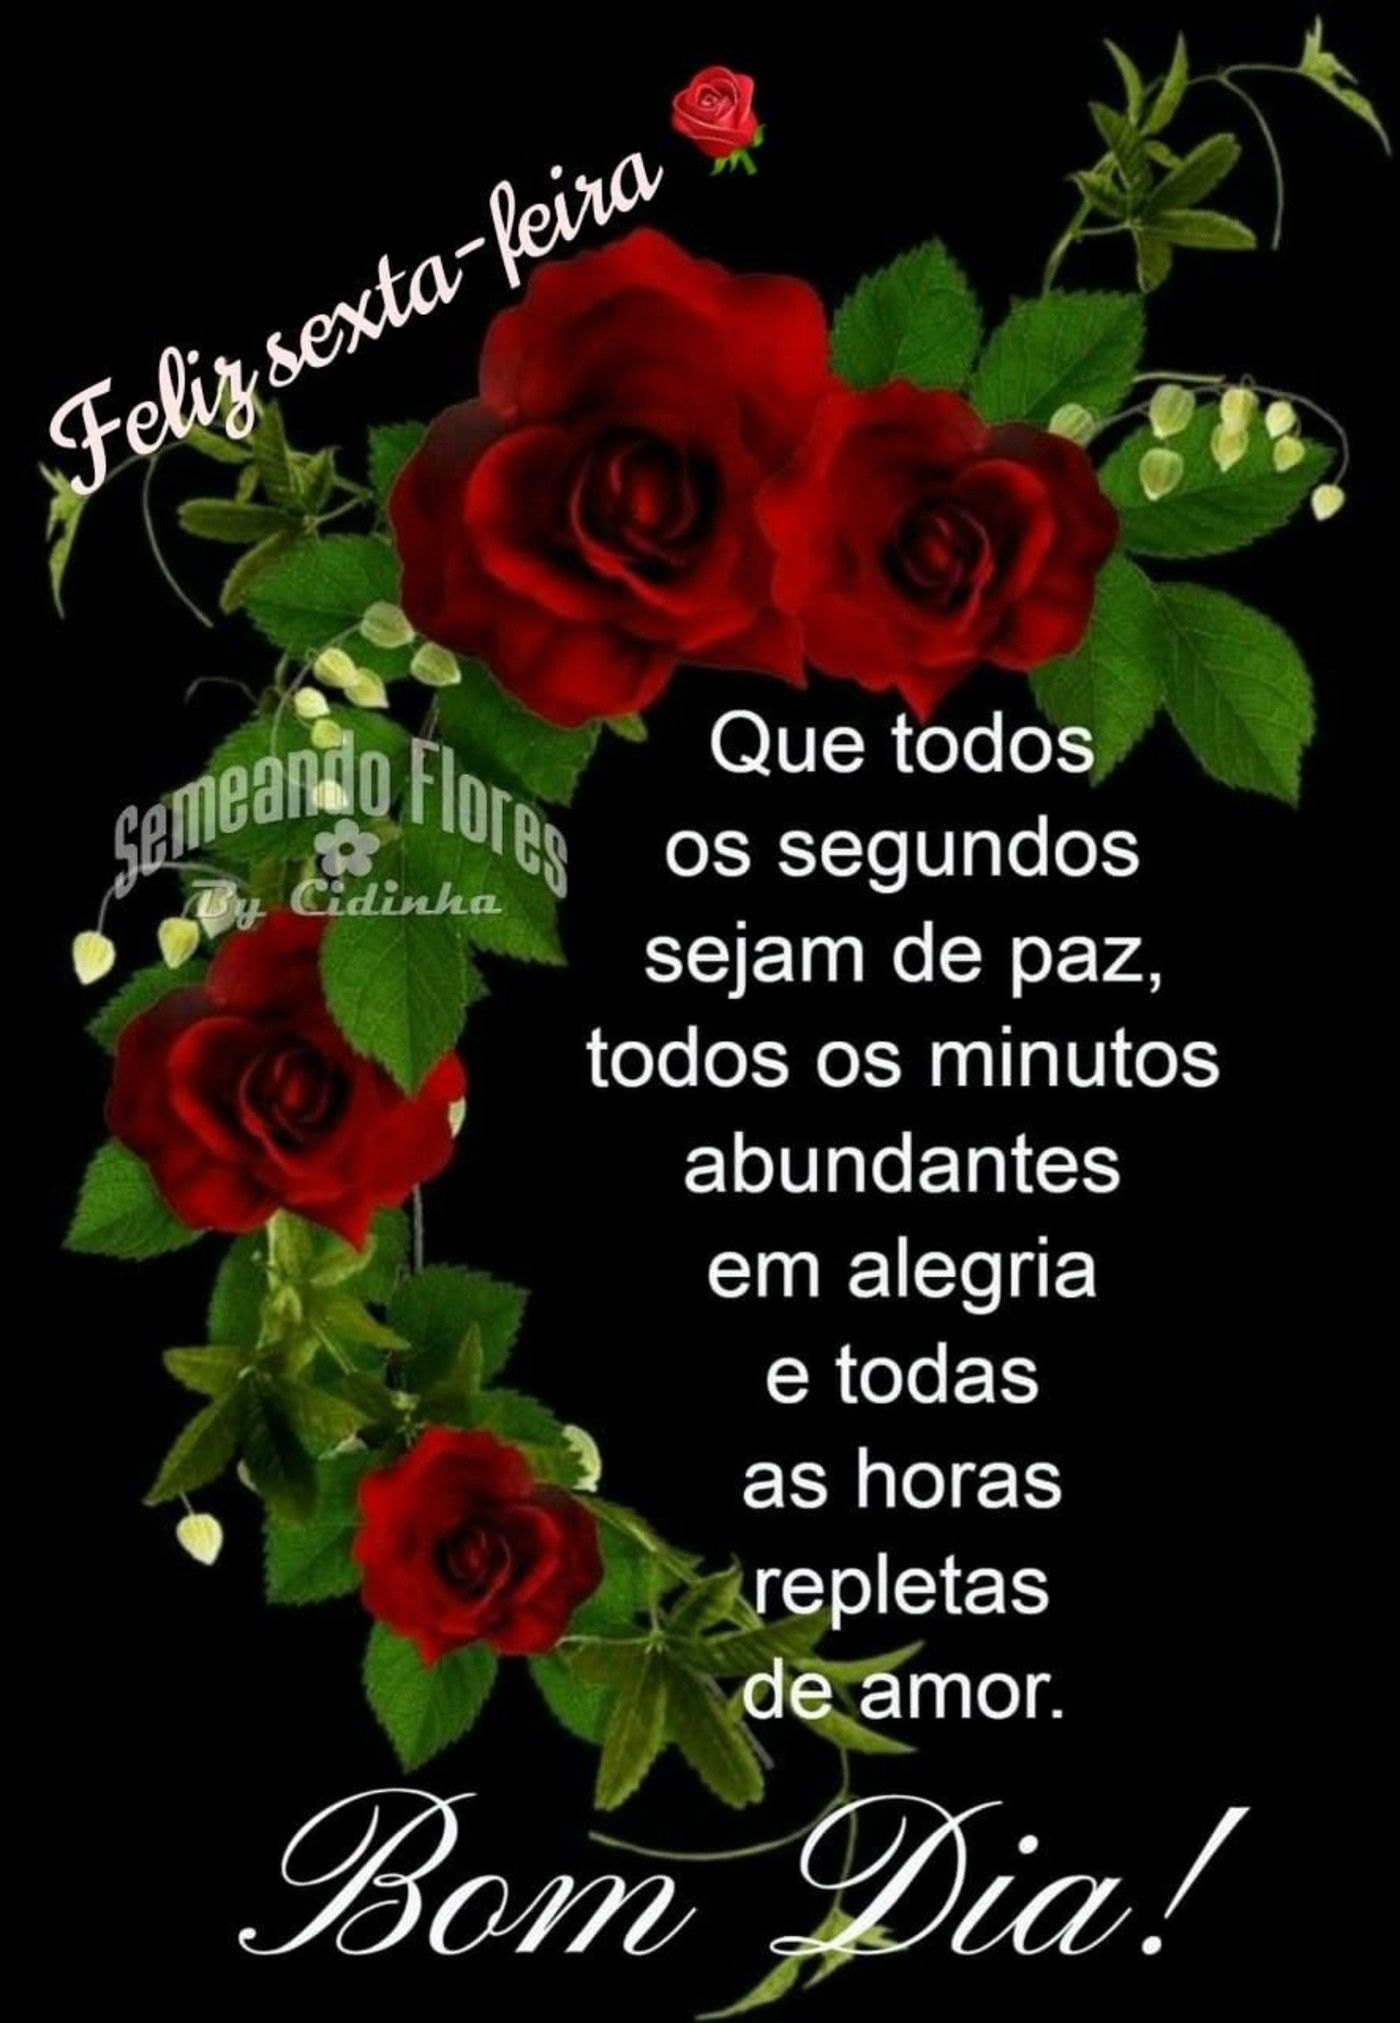 Feliz Sexta Feira Grupo Facebook 237 Com Imagens Feliz Sexta